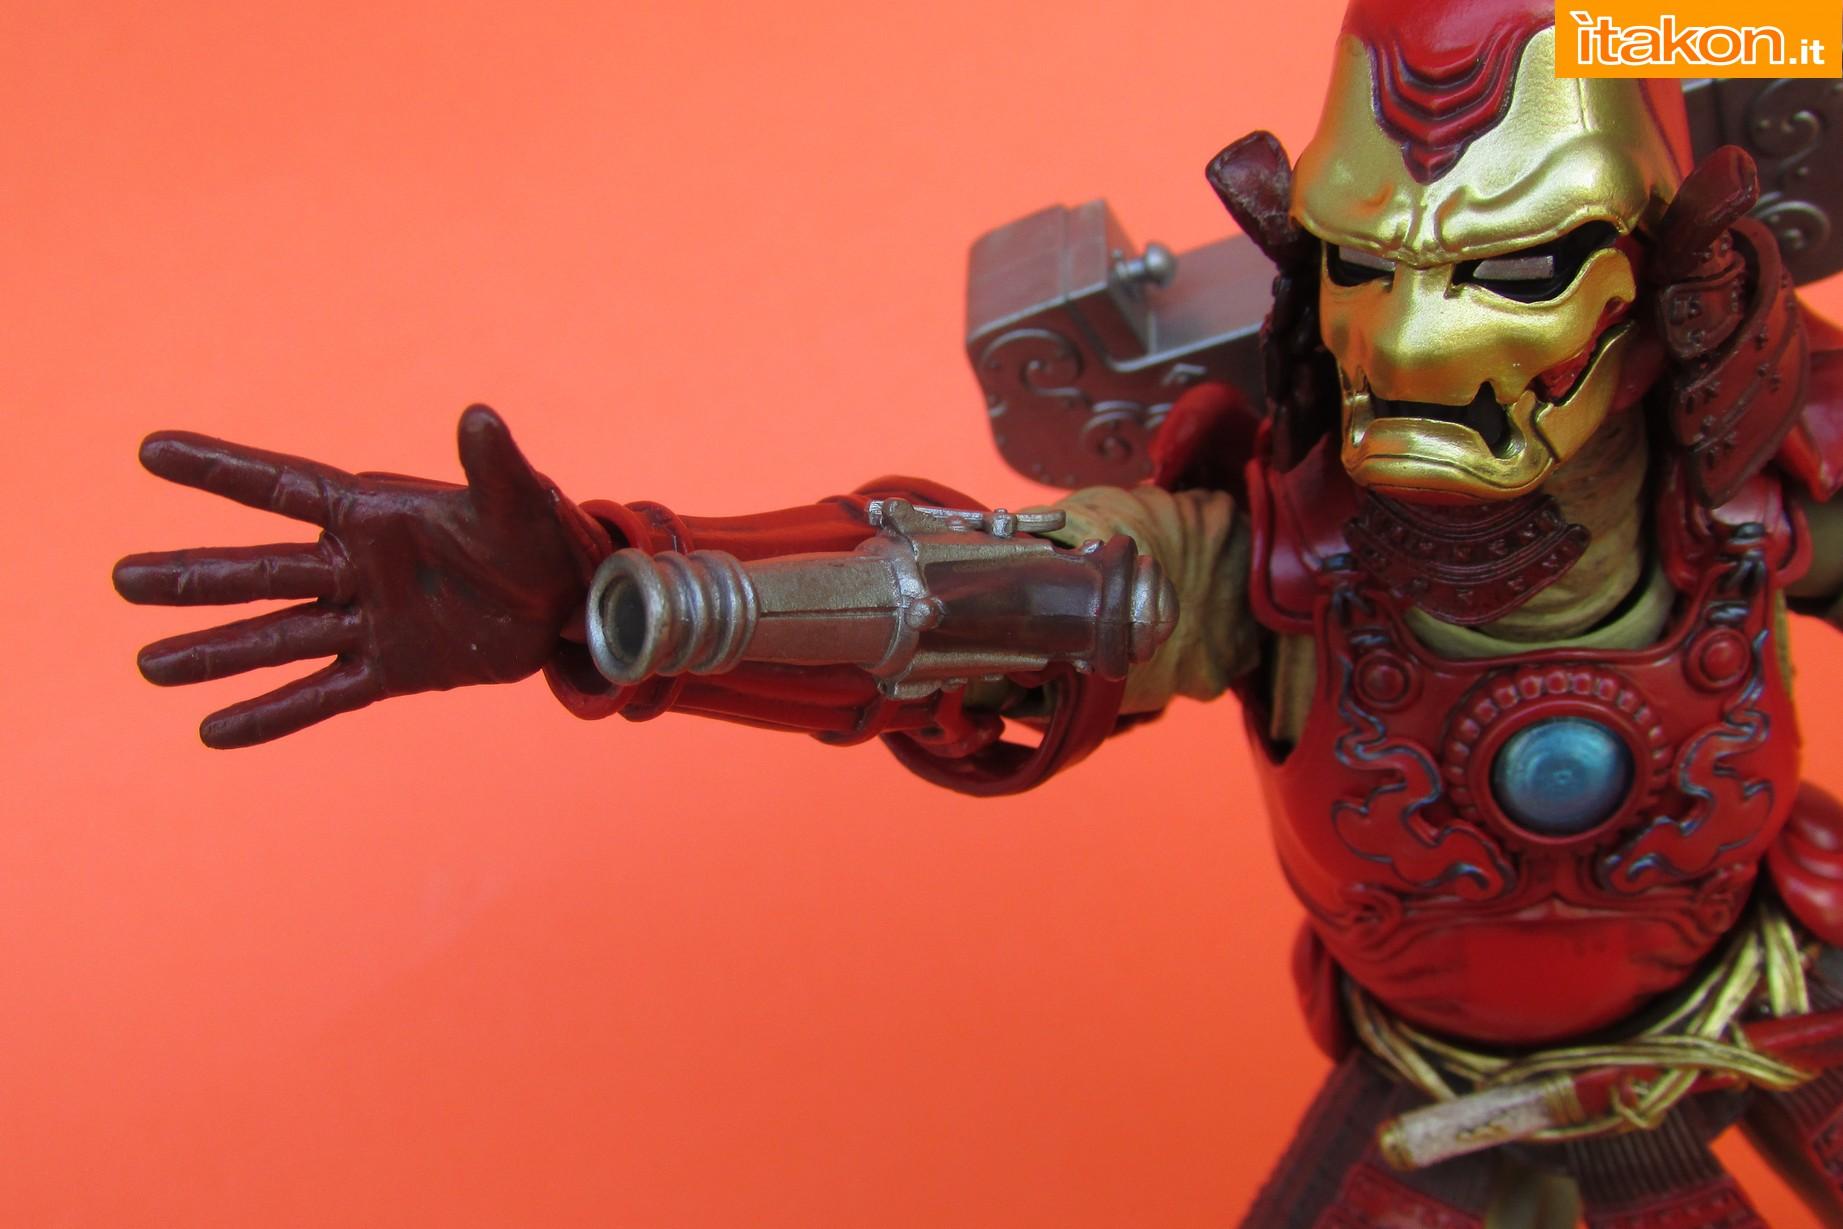 Link a Marvel Comics Koutetsu Samurai Iron Man Mark 3 Meishou MANGA REALIZATION review Bandai Itakon.it42